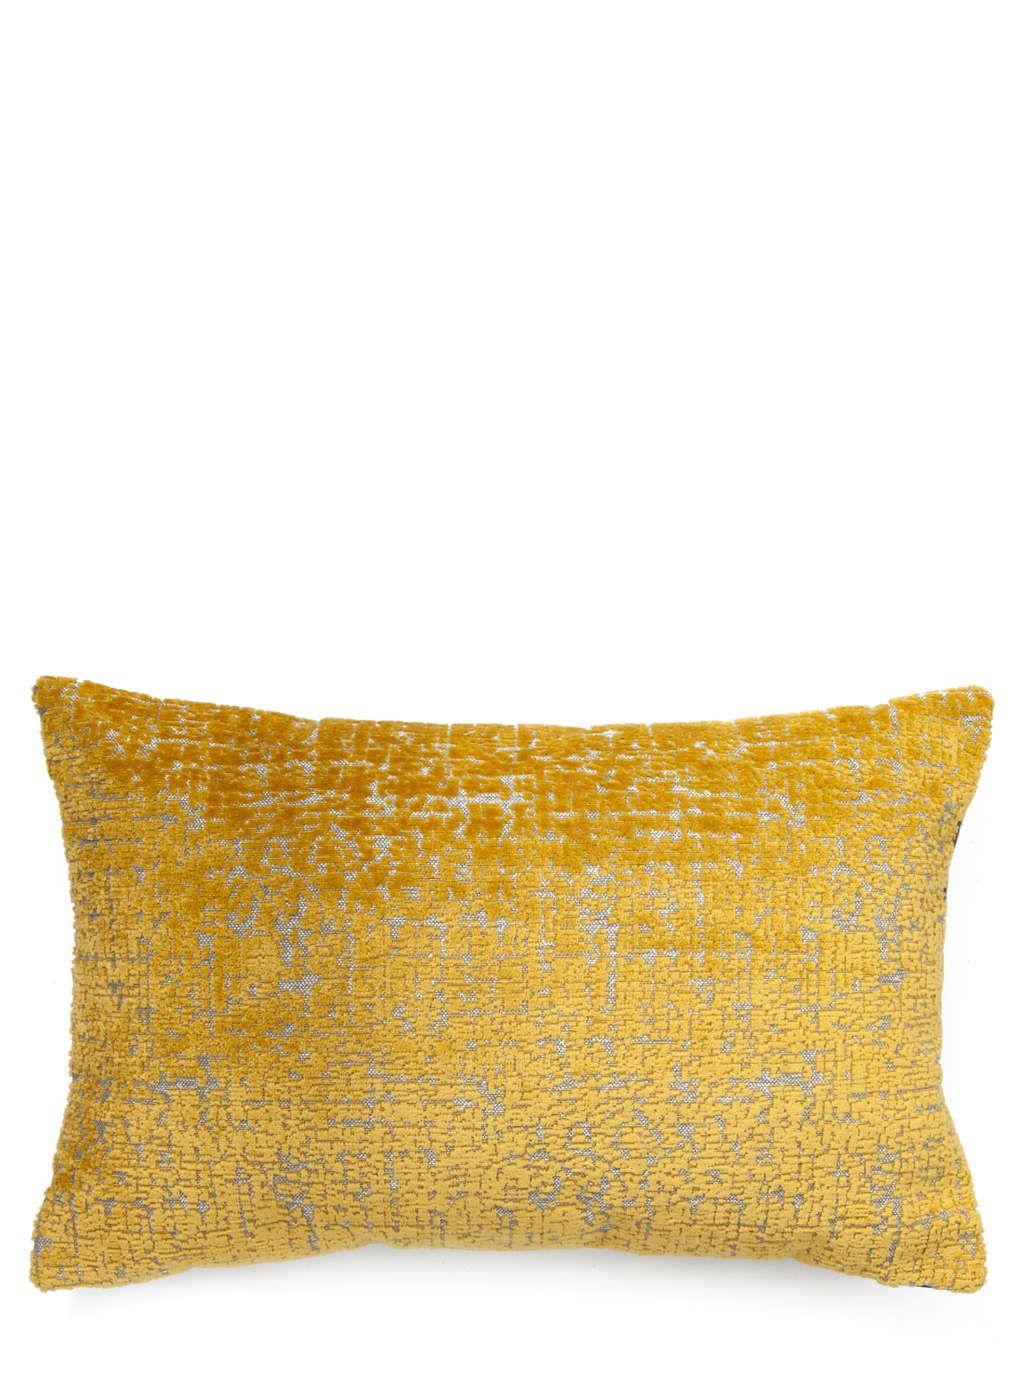 Mustard Distressed Velvet Cushion - BHS   c16   Pinterest   Bhs ...